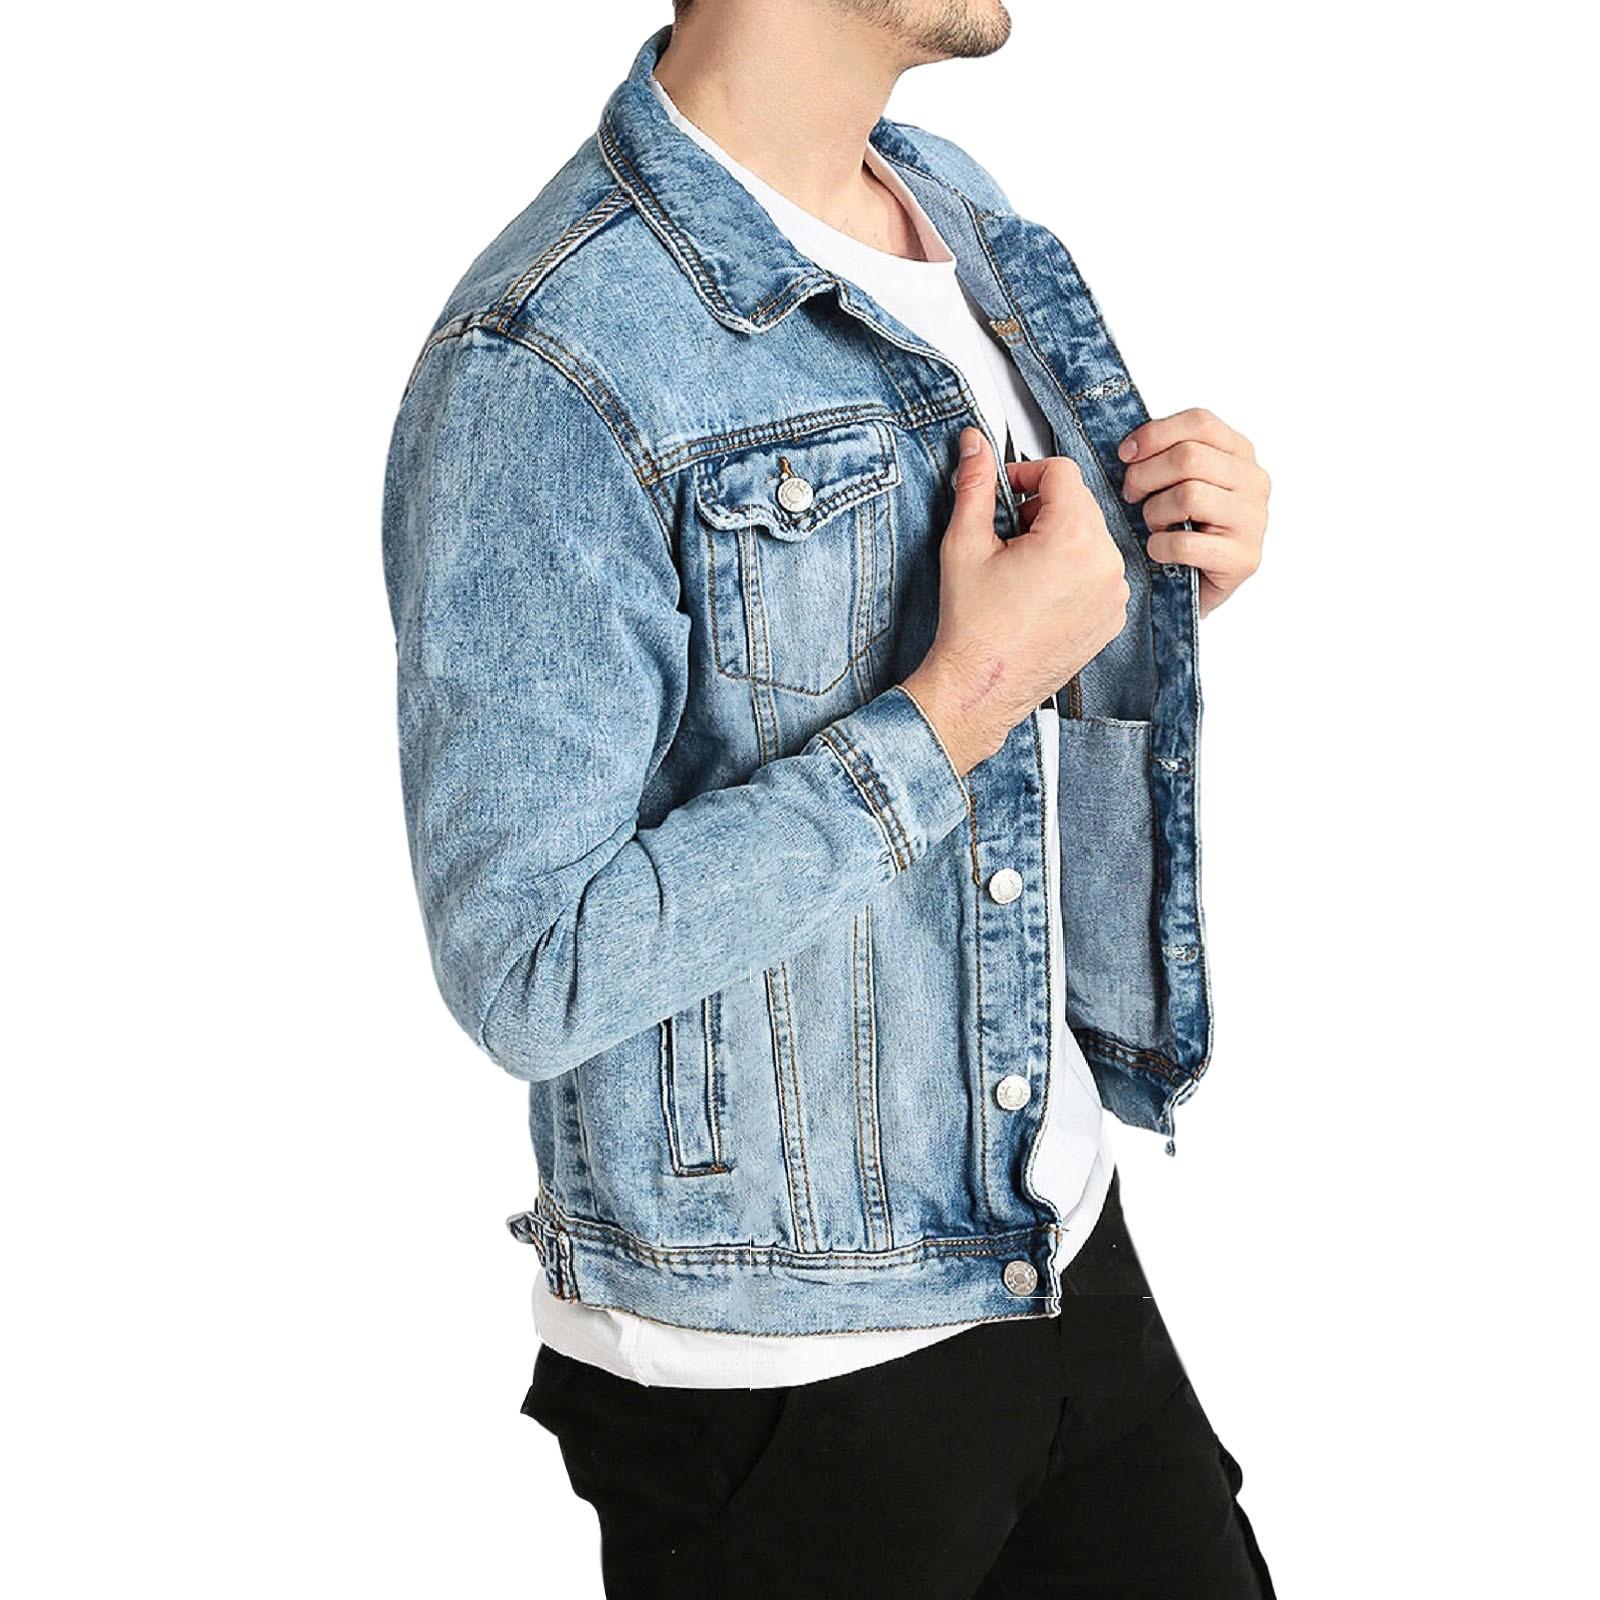 Giubbino-Jeans-Uomo-Giacca-Denim-Casual-Giacca-Slim-Fit-Blu-Chiaro miniatura 12